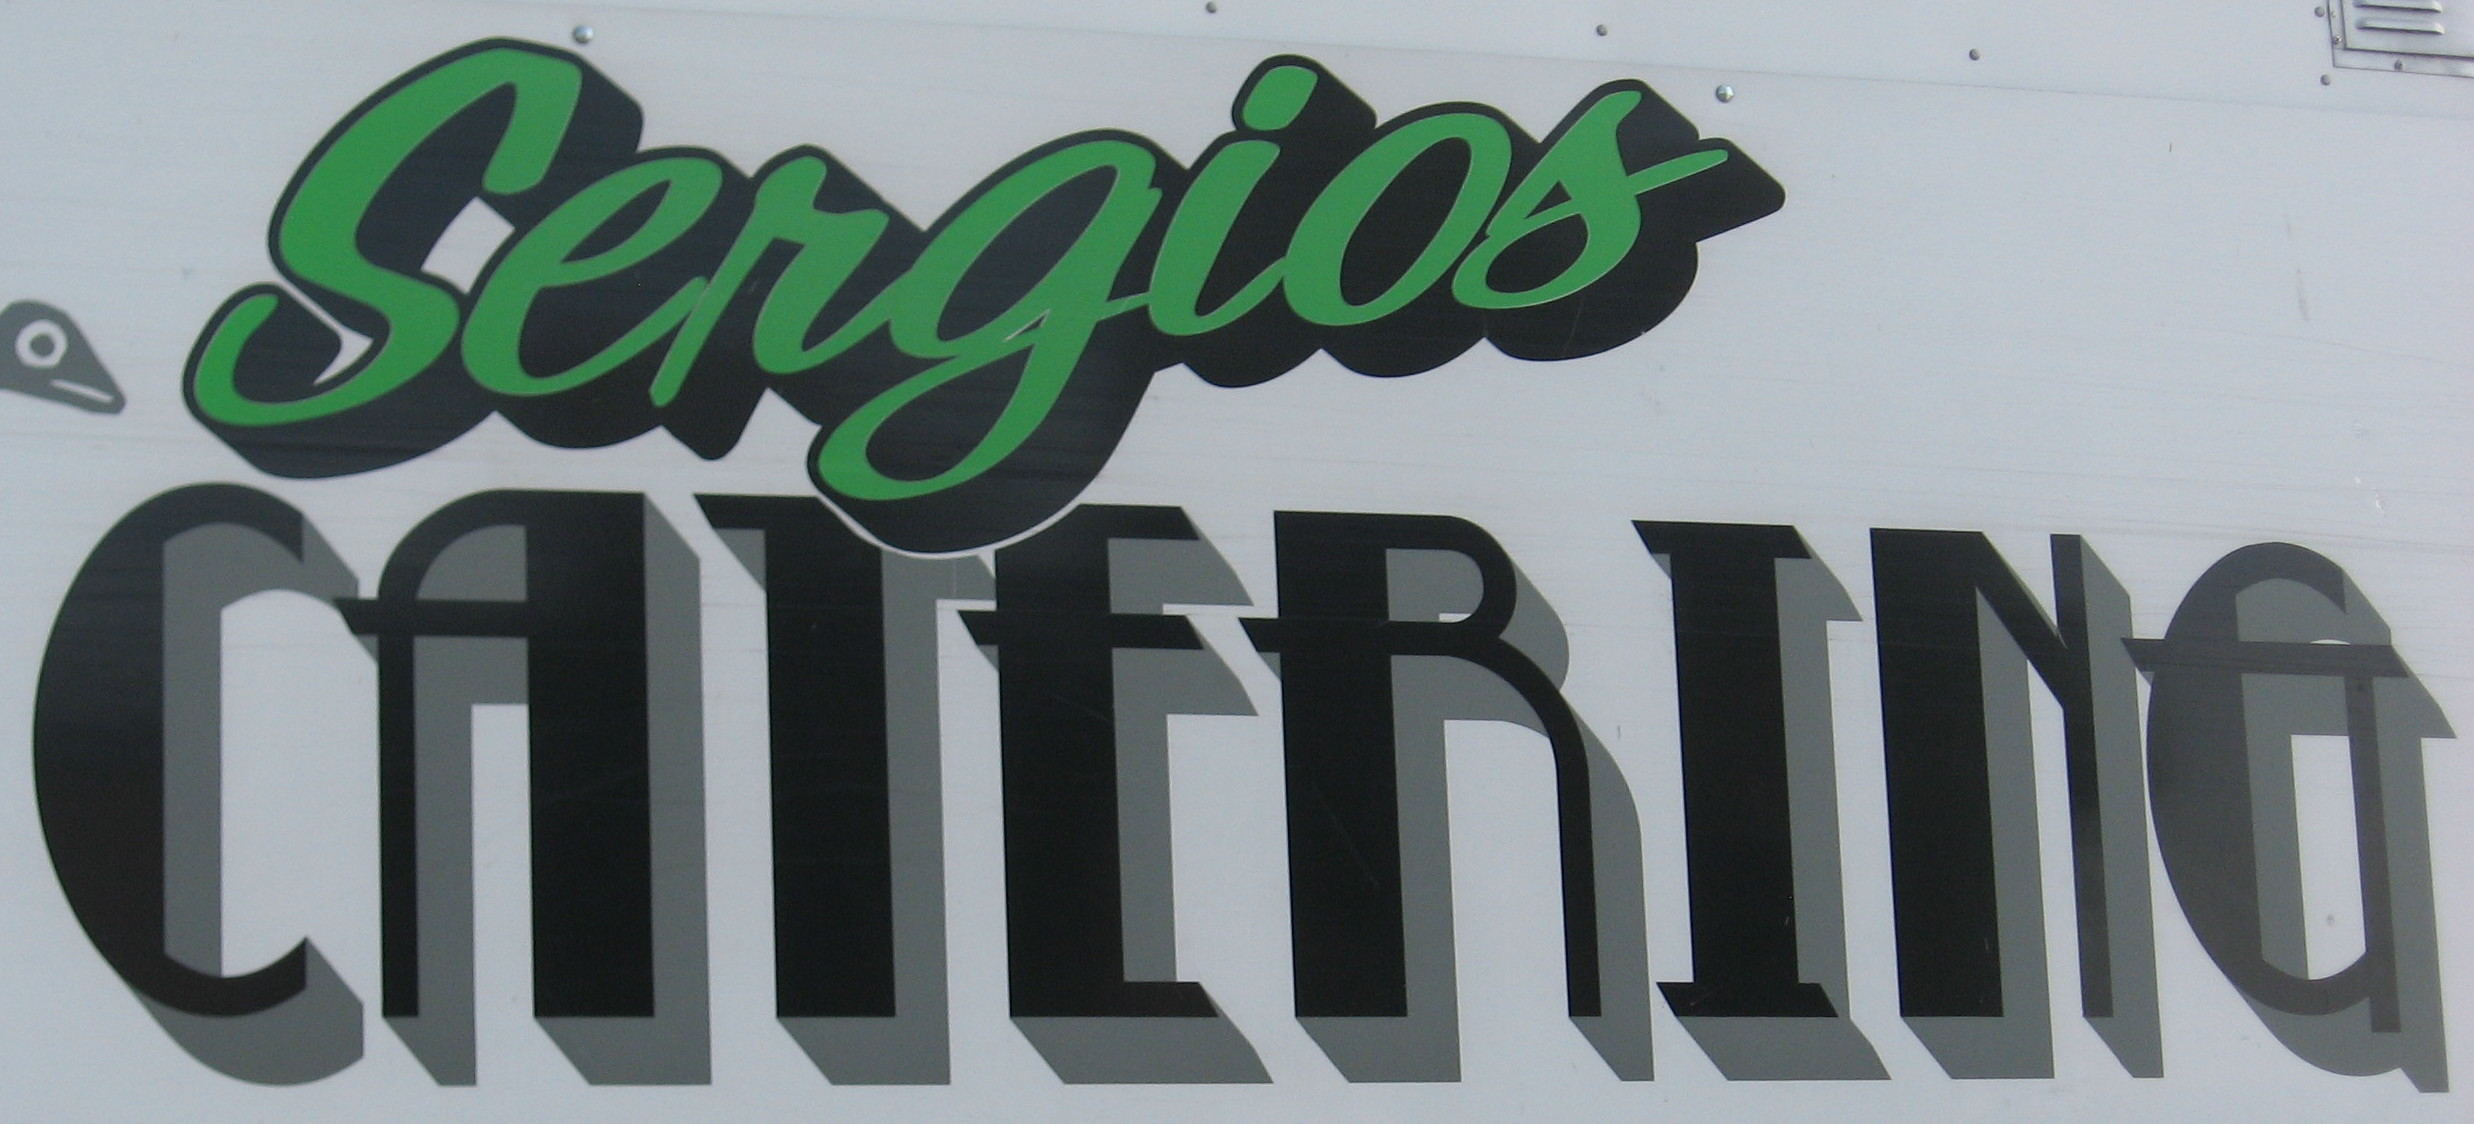 Sergio's Catering Image